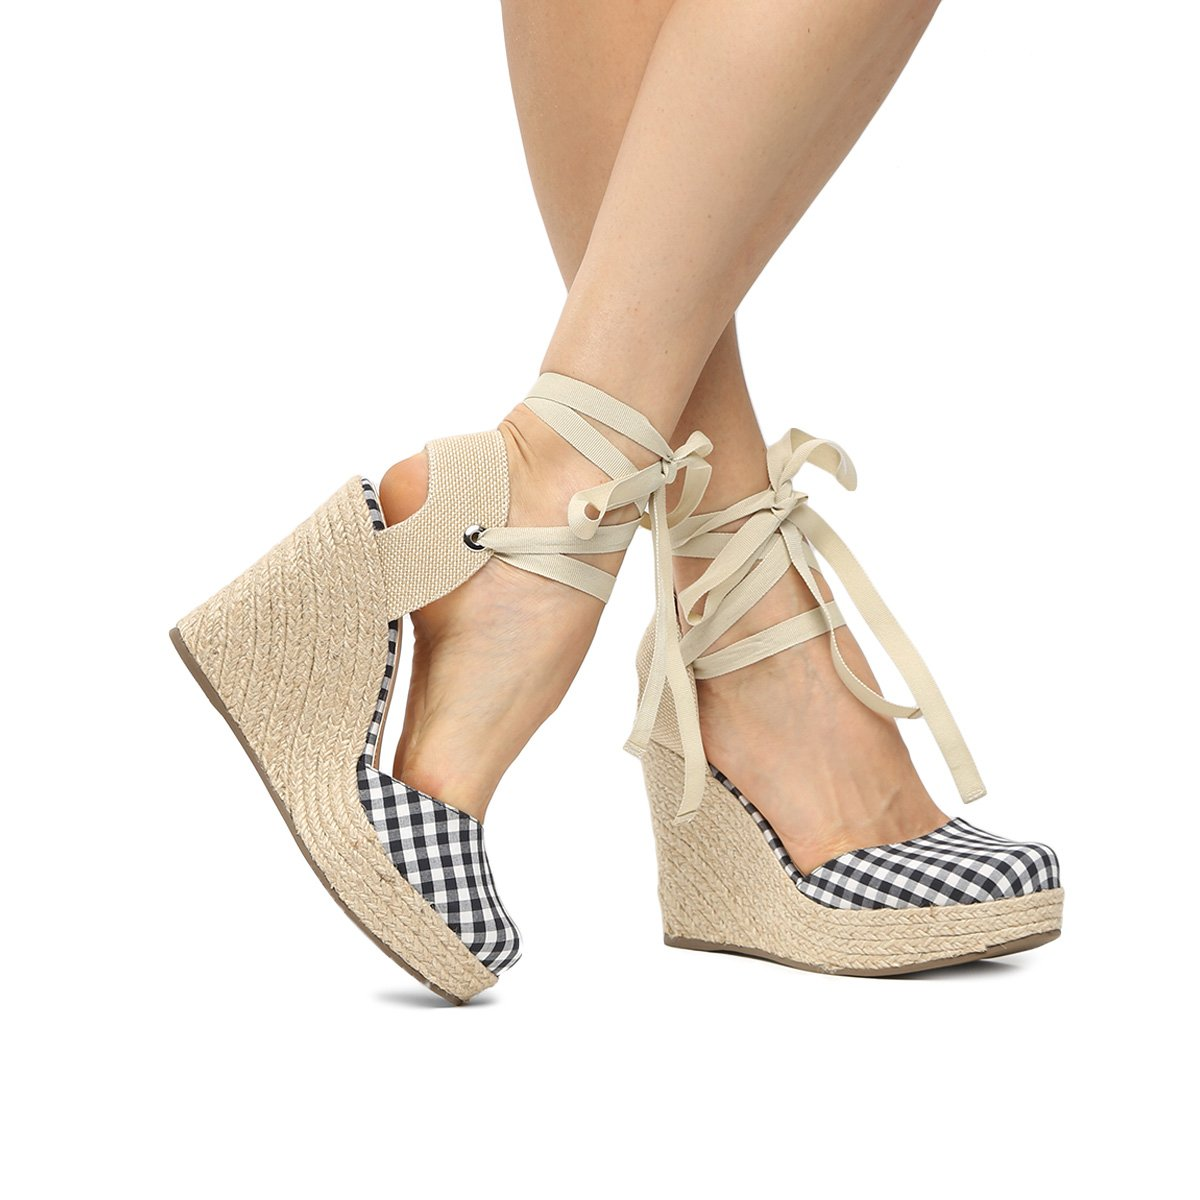 59738c3ea Espadrille Shoestock Plataforma Feminina - Preto | Shoestock